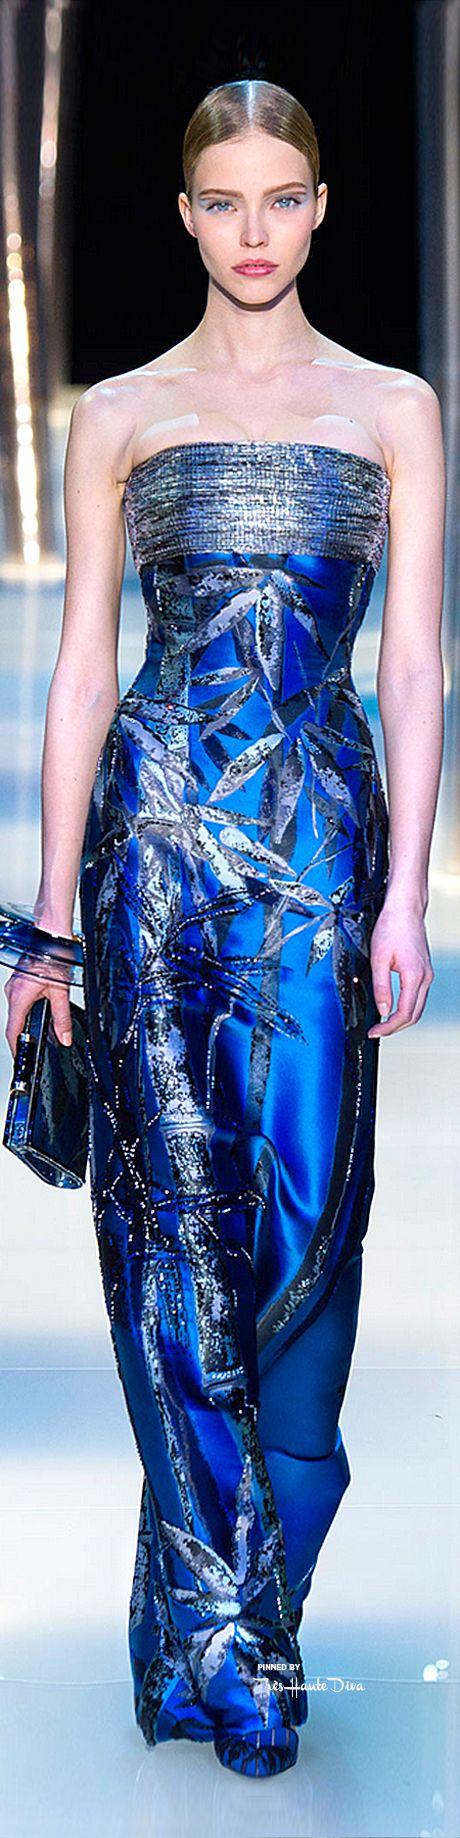 The Gown Boutique / karen cox.  Armani Privé Spring 2015 Couture  ♔THD♔